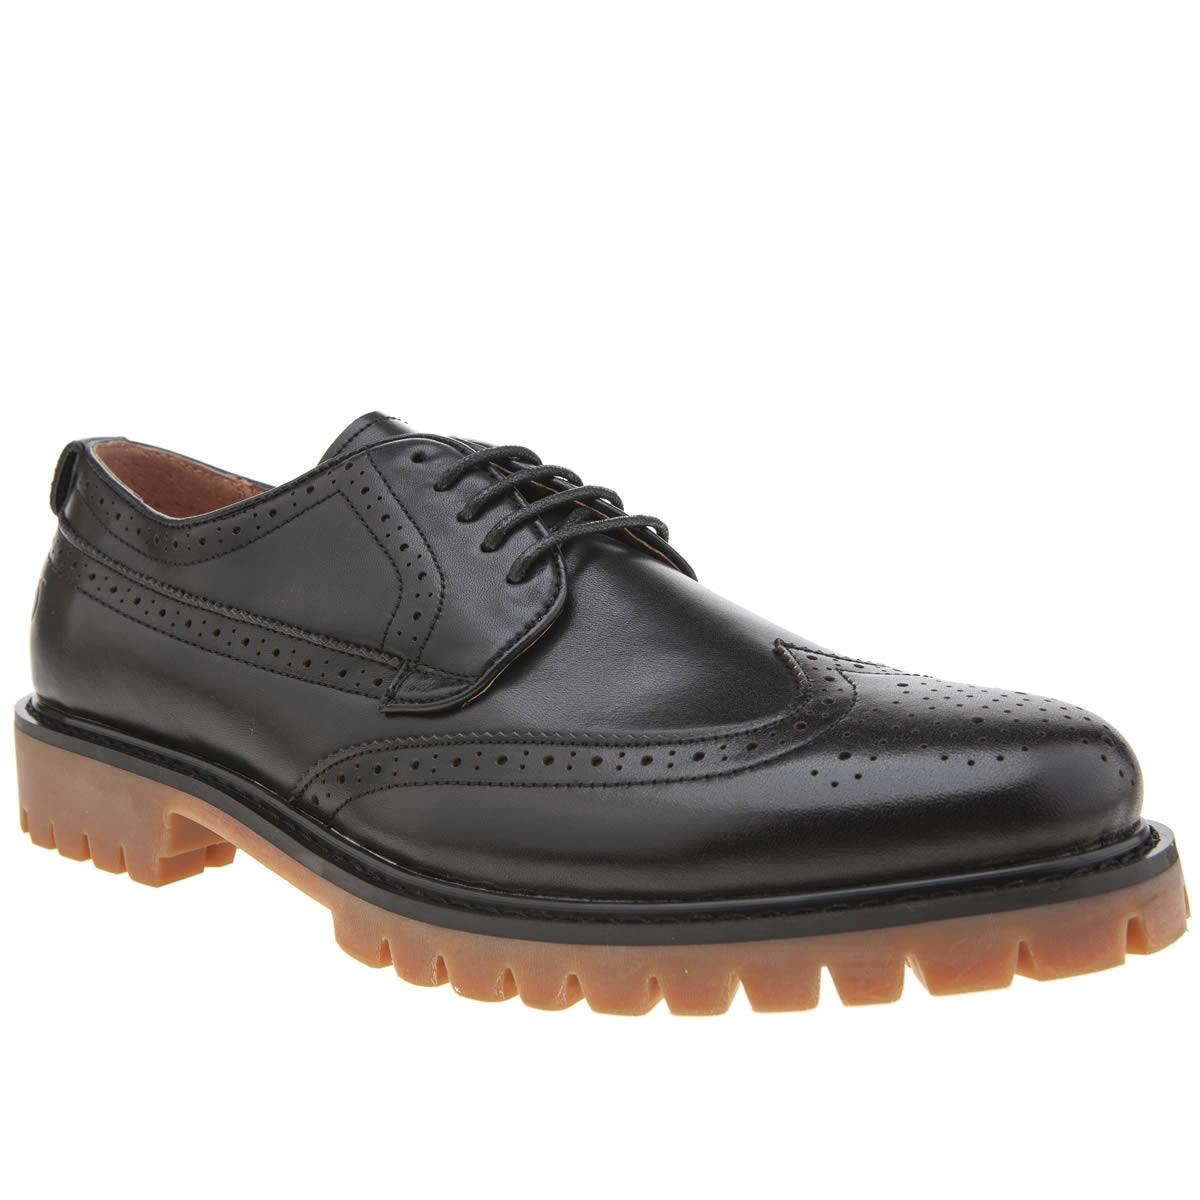 Peter Werth Peter Werth Black Oldman Brogue Shoes